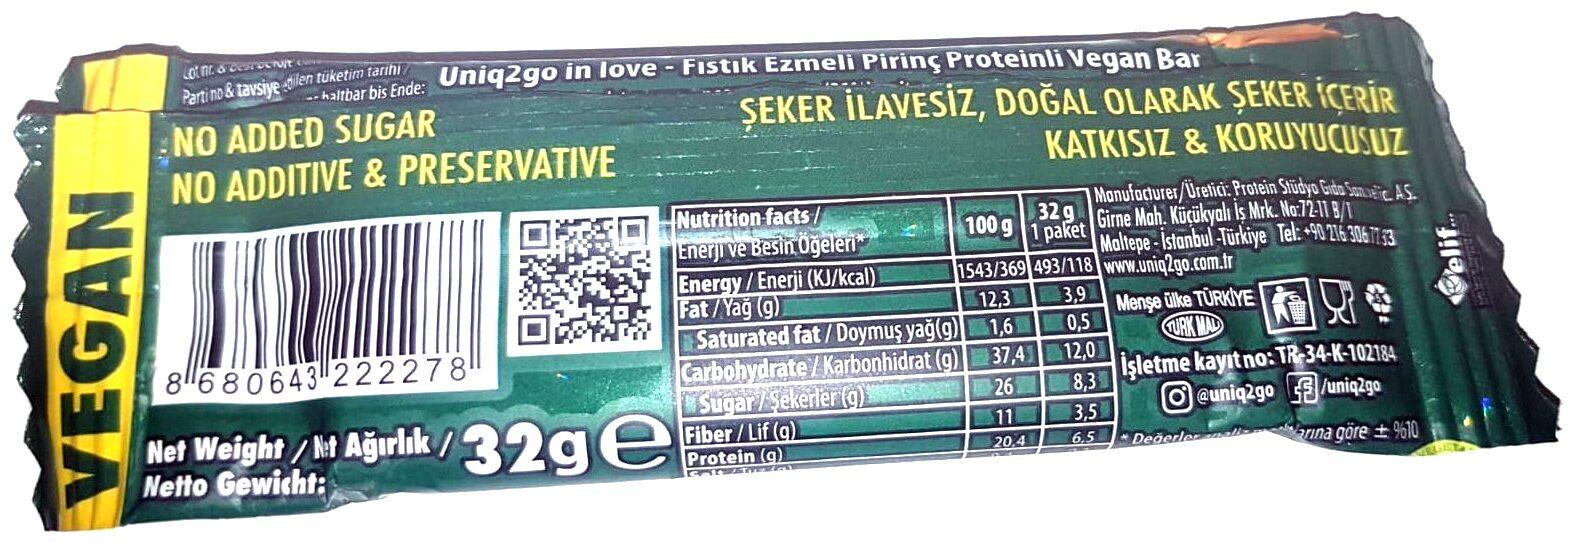 Uniq2go Crunchy Peanutpaste VEGAN - Ürün